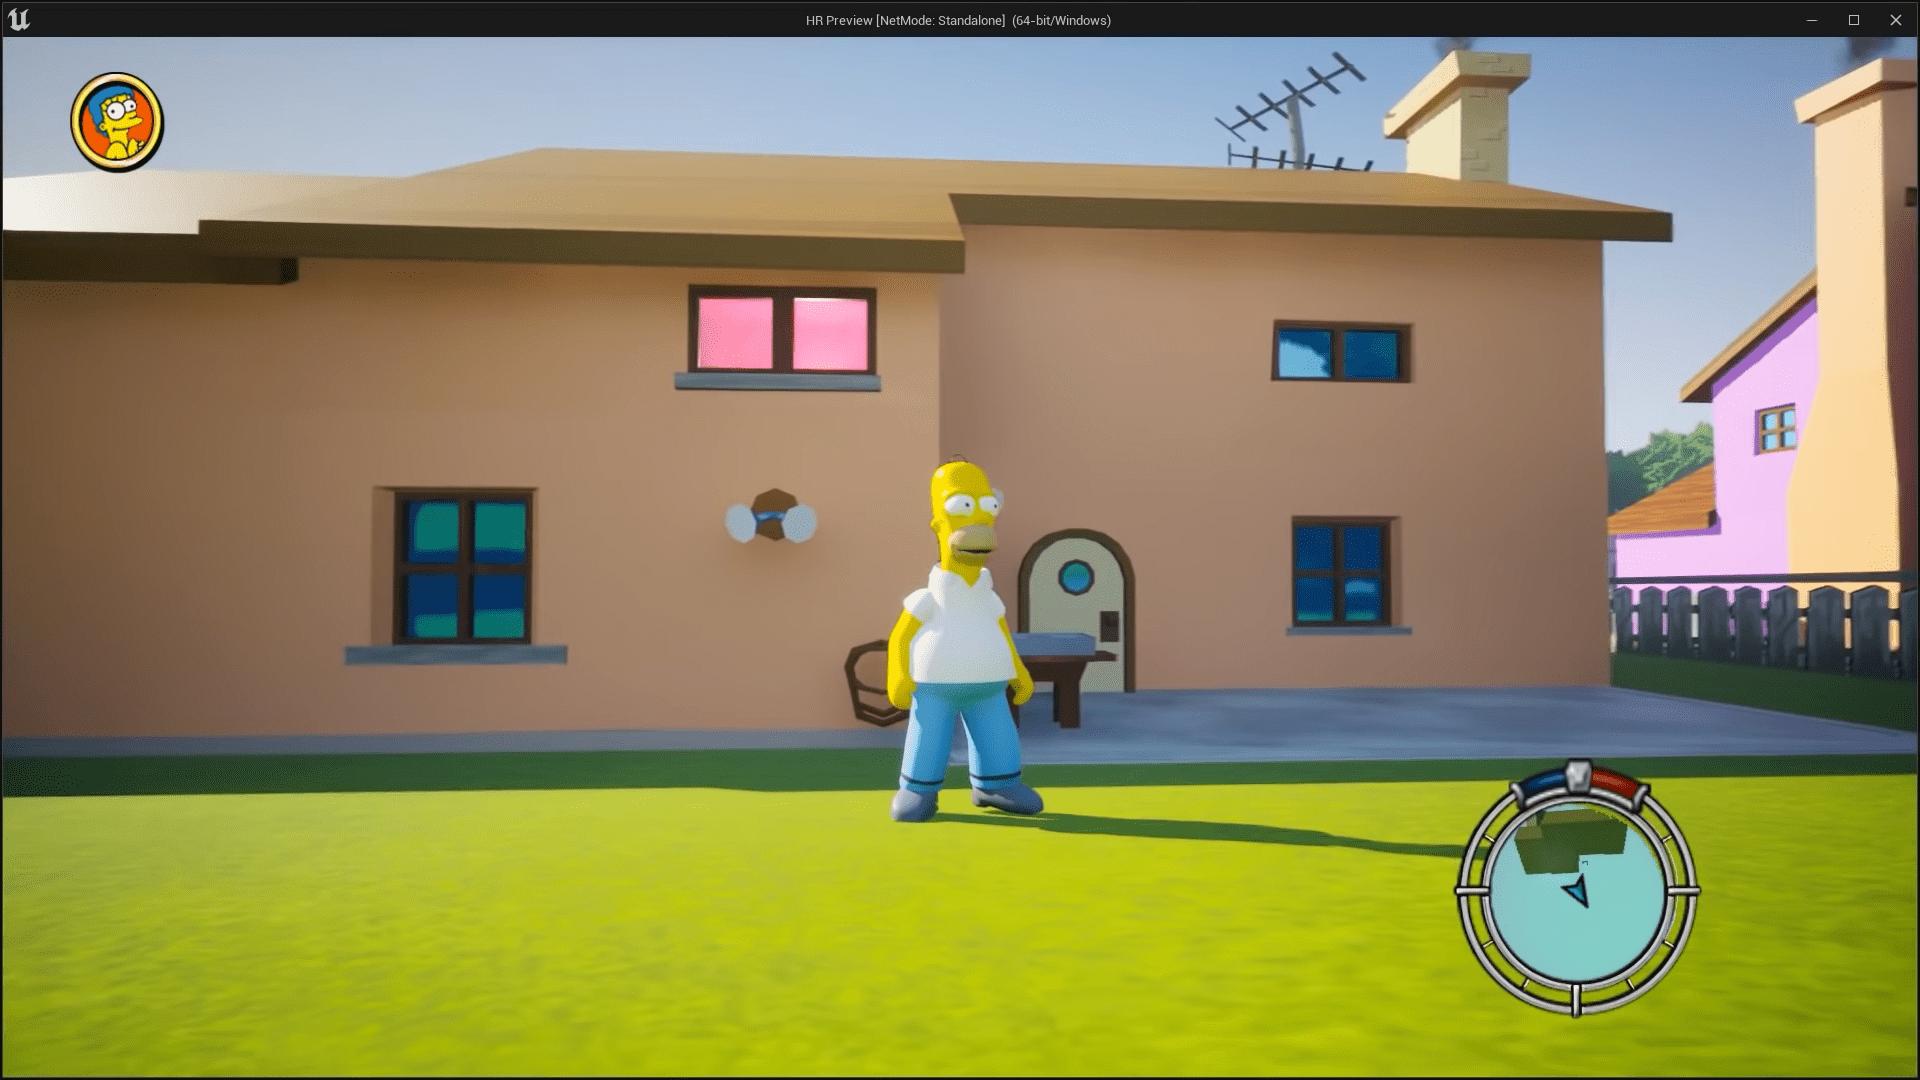 Spiel, The Simpsons, The Simpsons: Hit & Run, Simpsons: Hit & Run